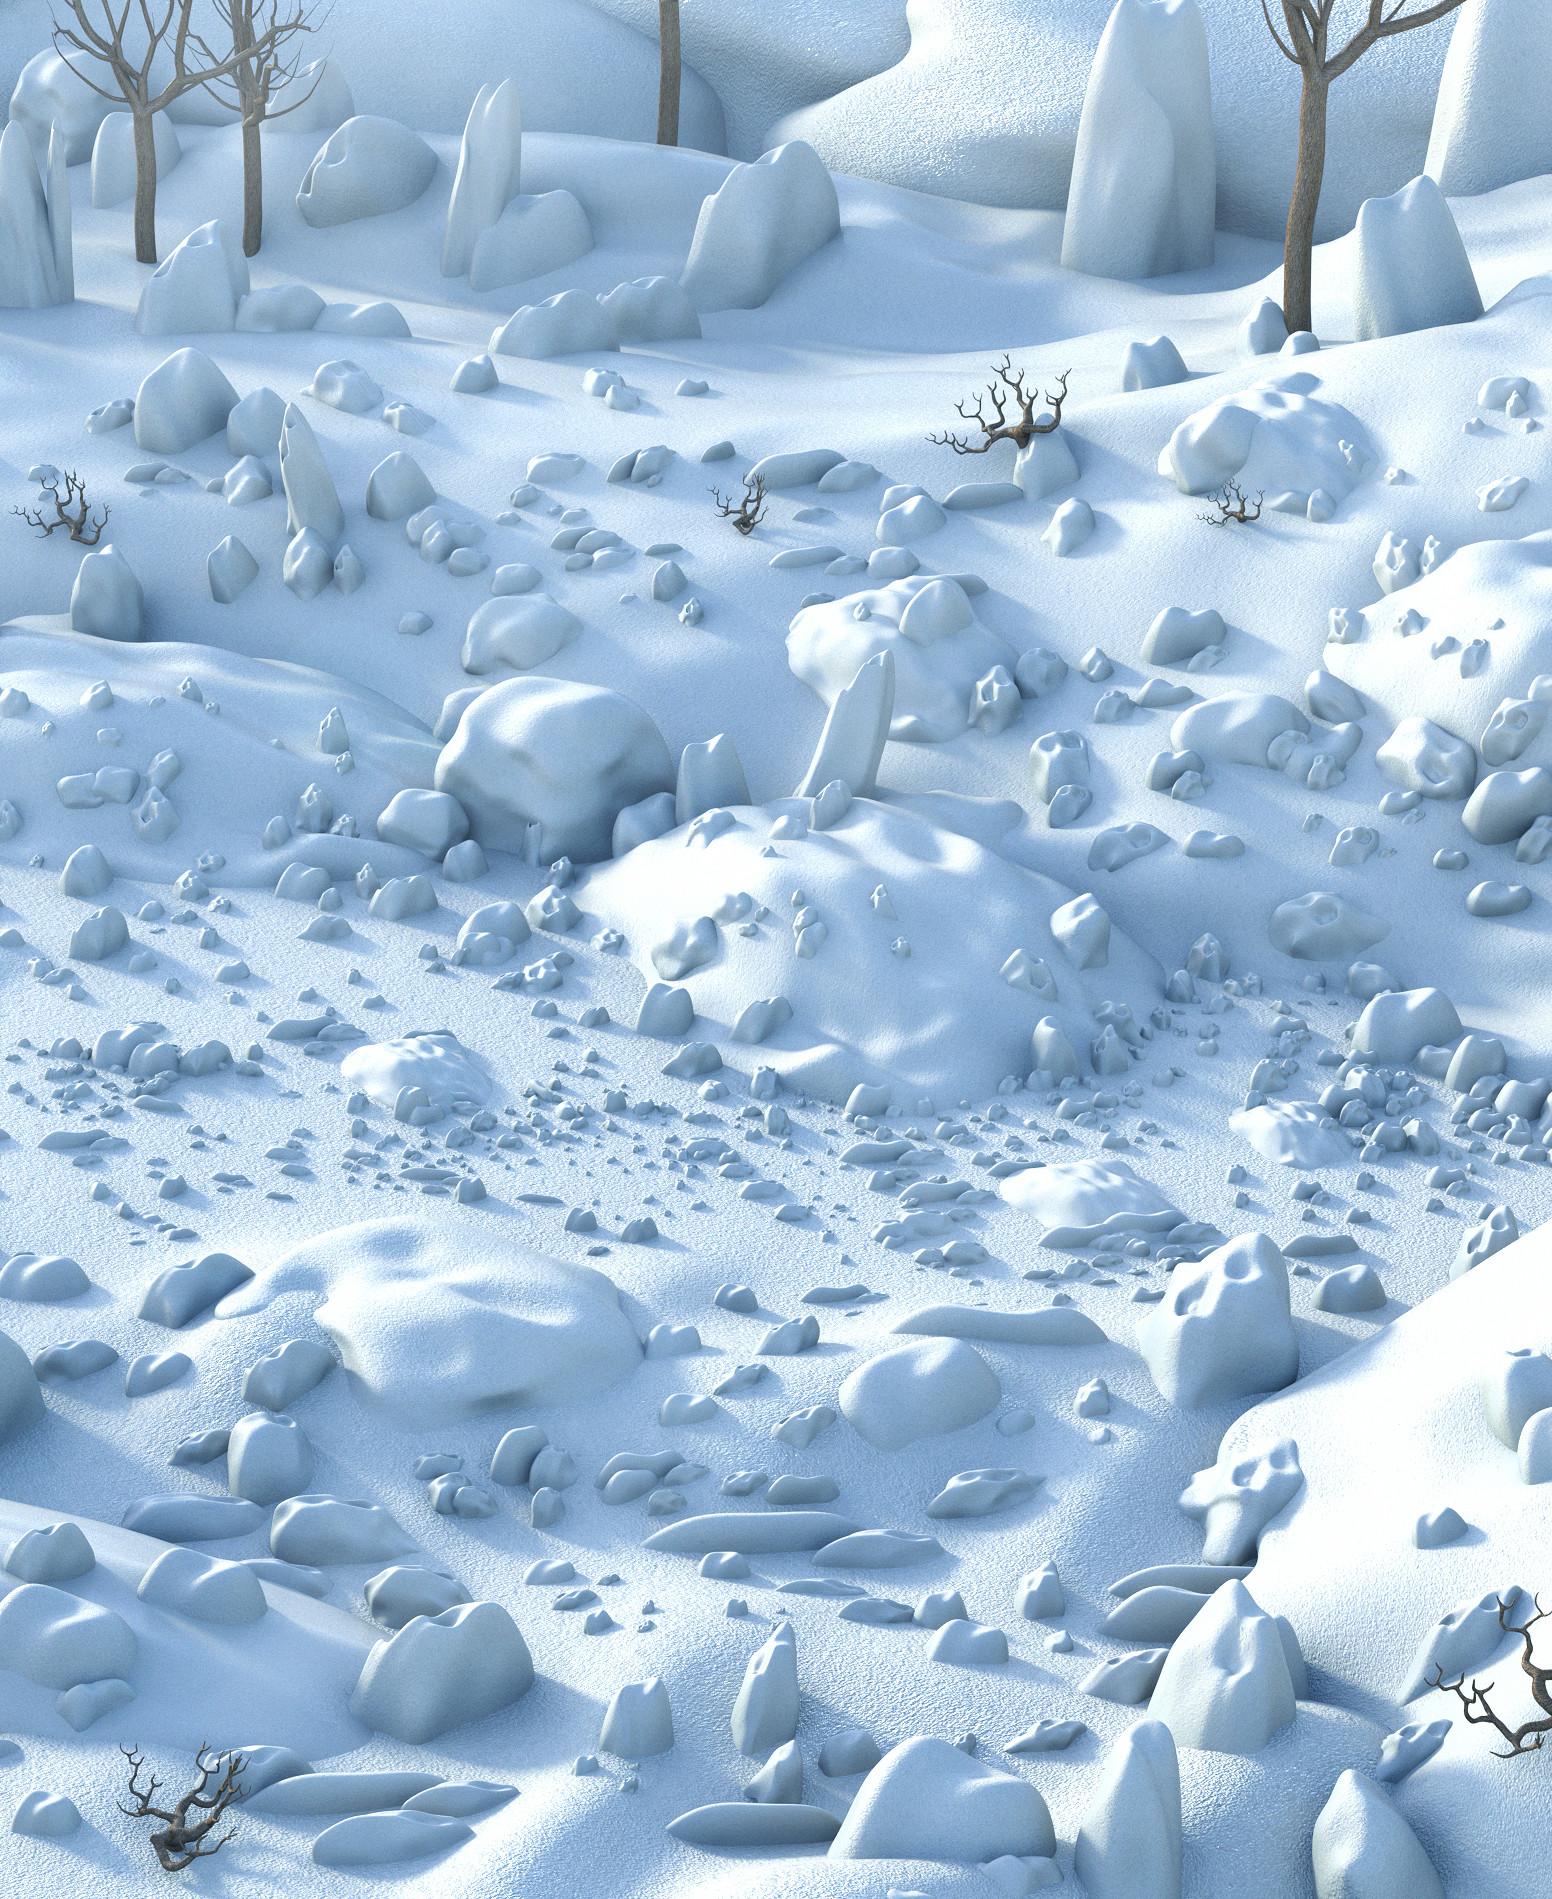 Marc mons snow13